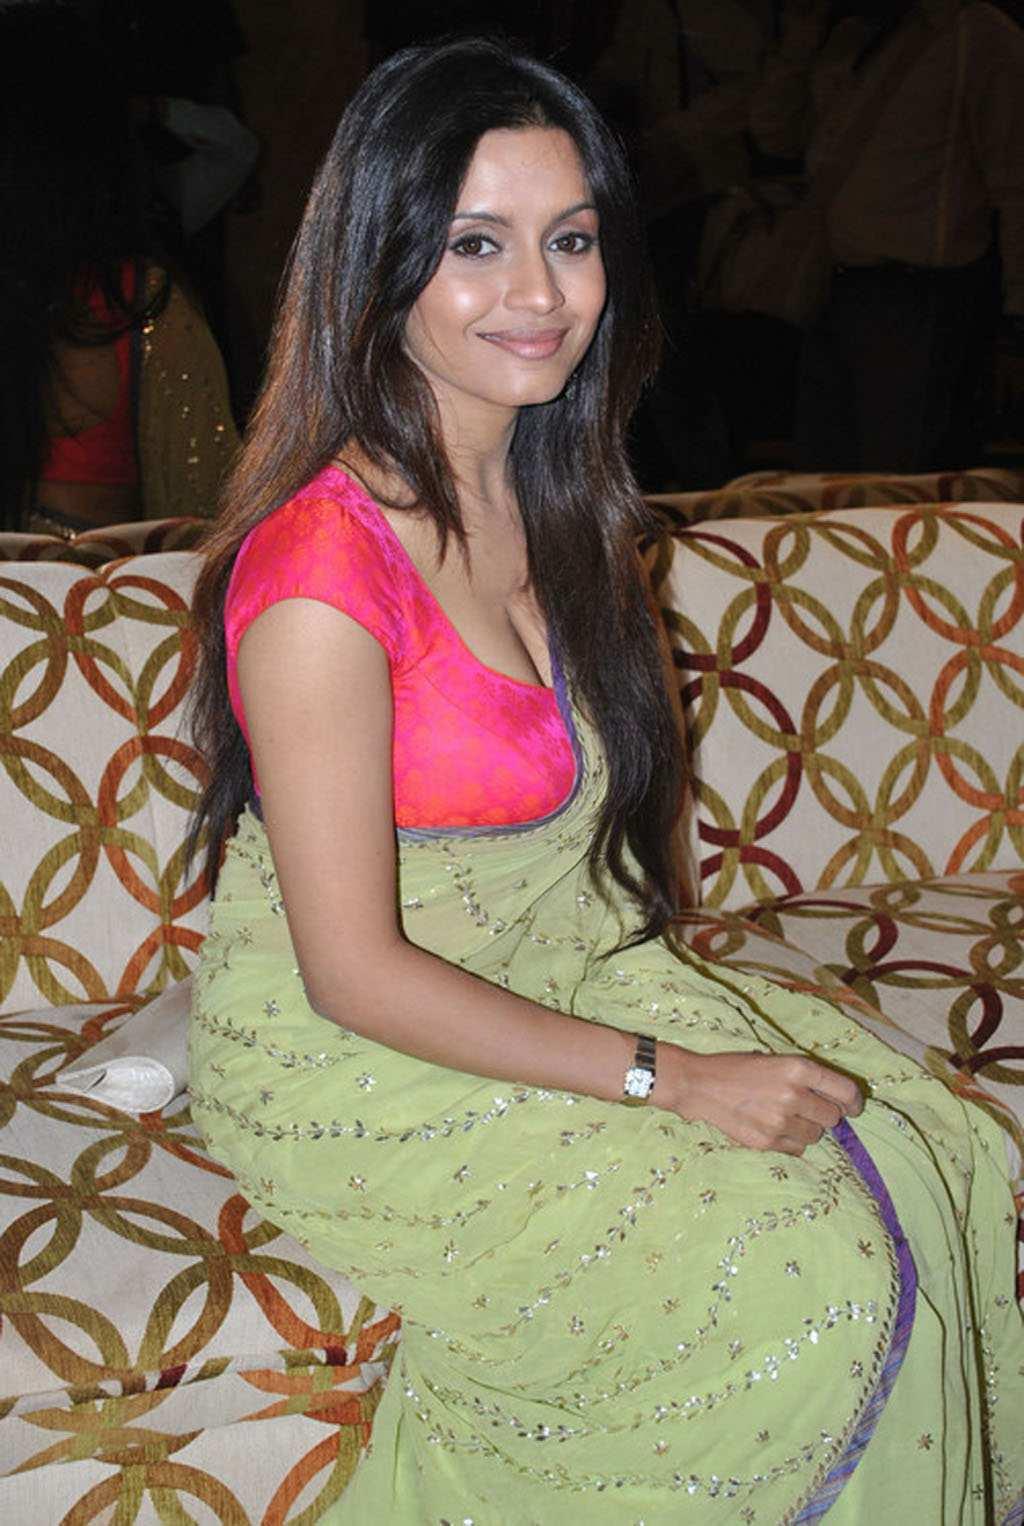 Bhavana Paani Spicy Saree Pics - Indian Actresses Boobs In Saree , HD Wallpaper & Backgrounds